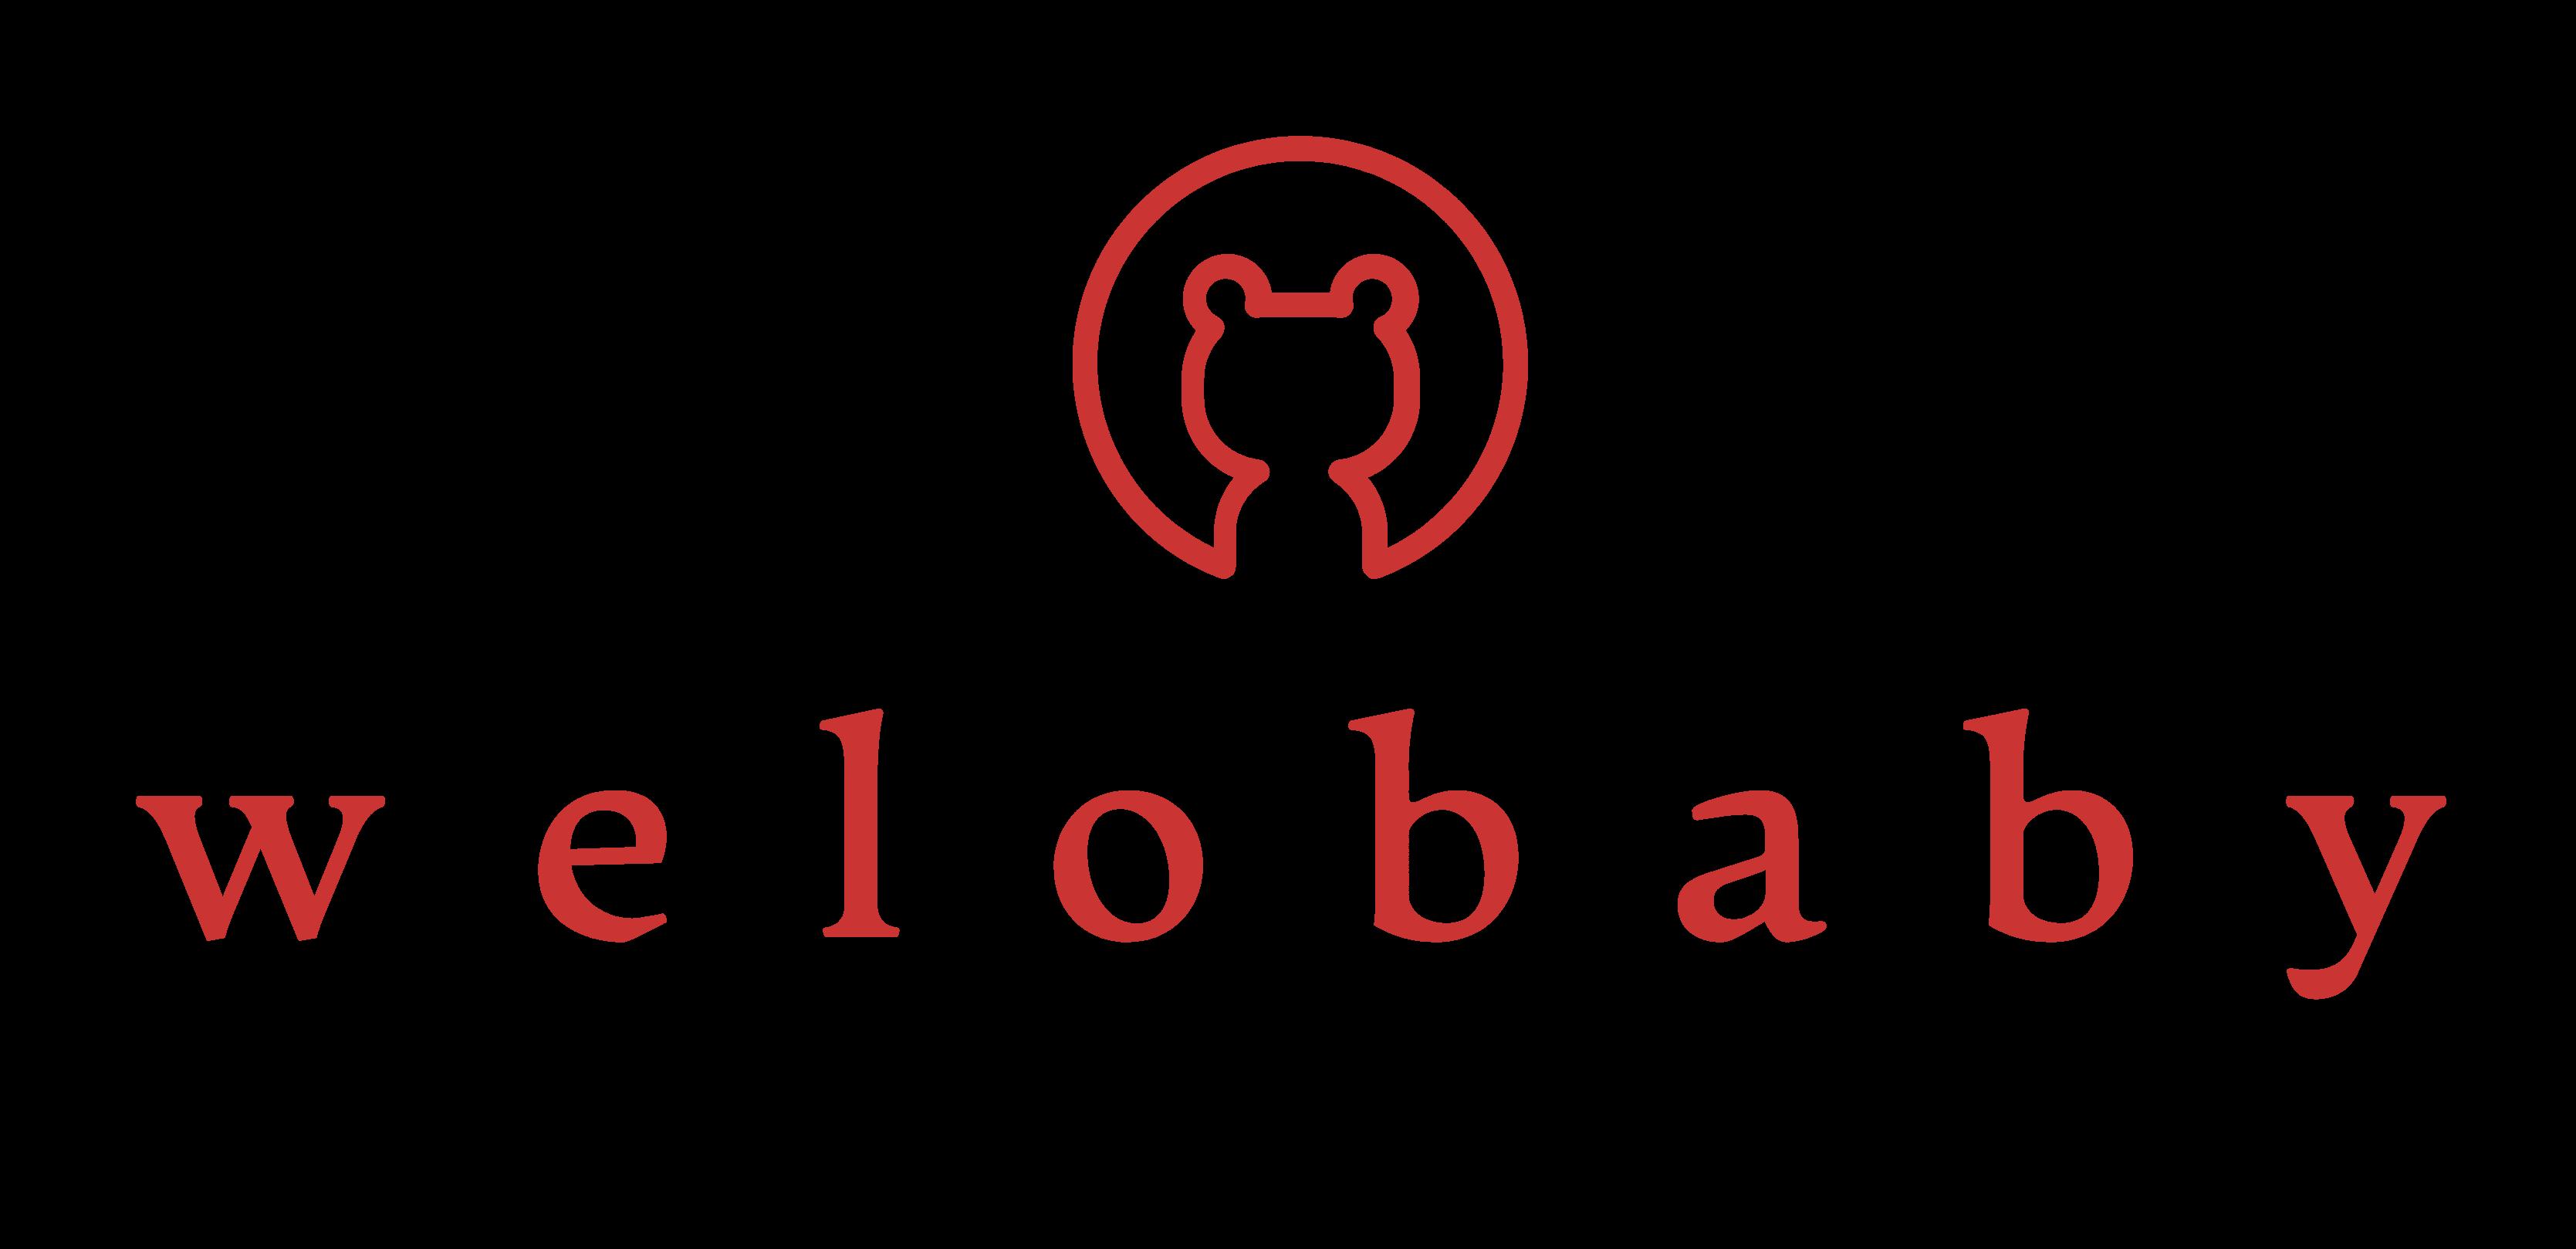 Color-logo-no-background.png